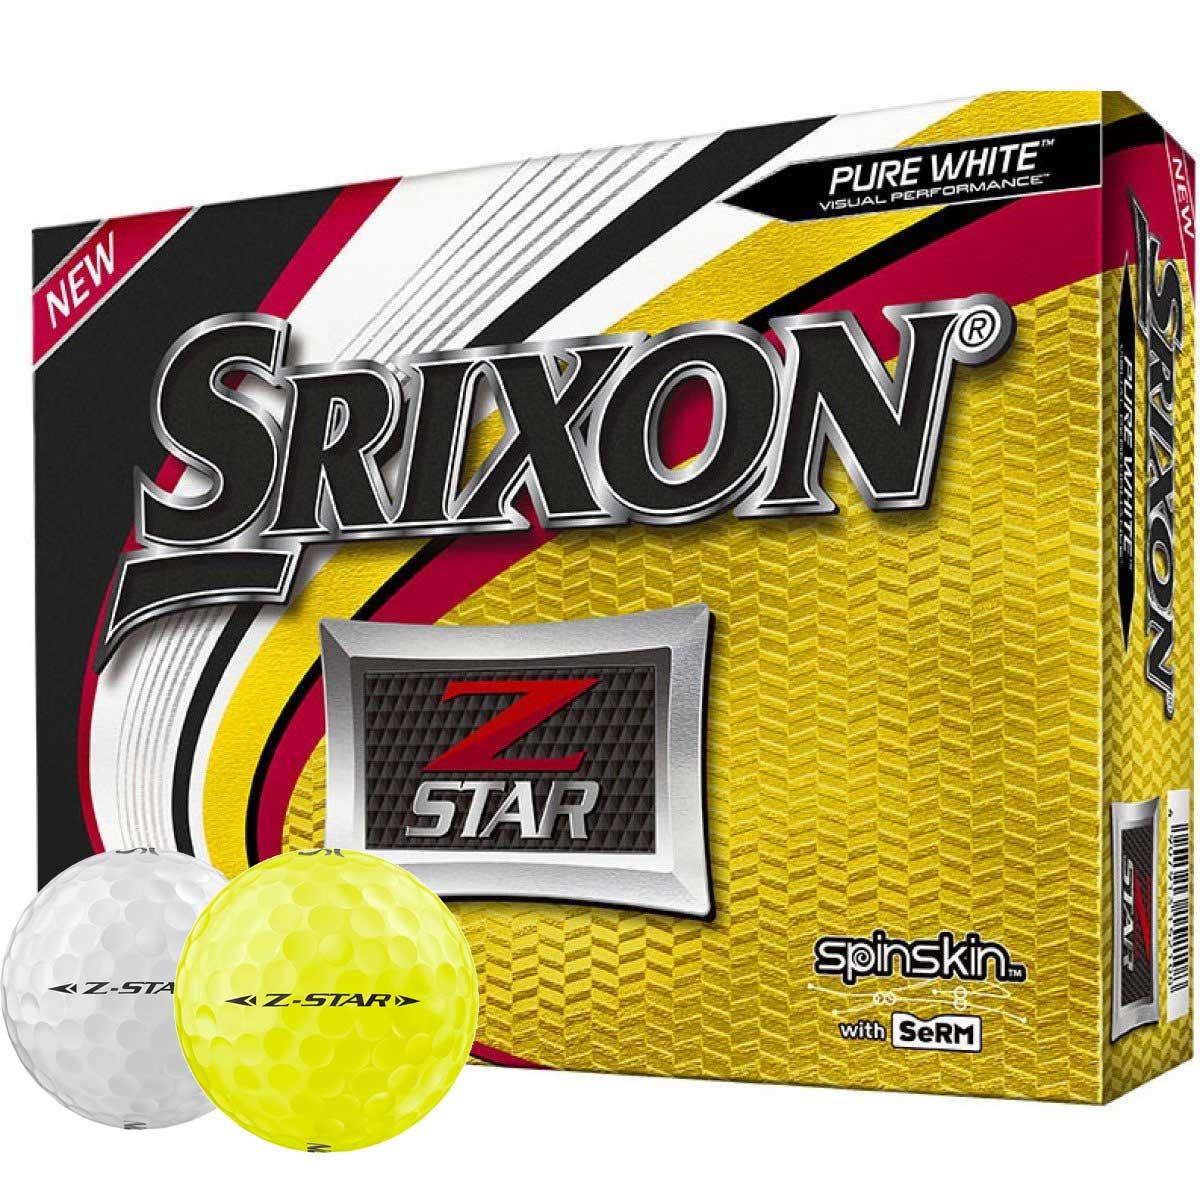 Srixon Z Star 6 Golf Balls